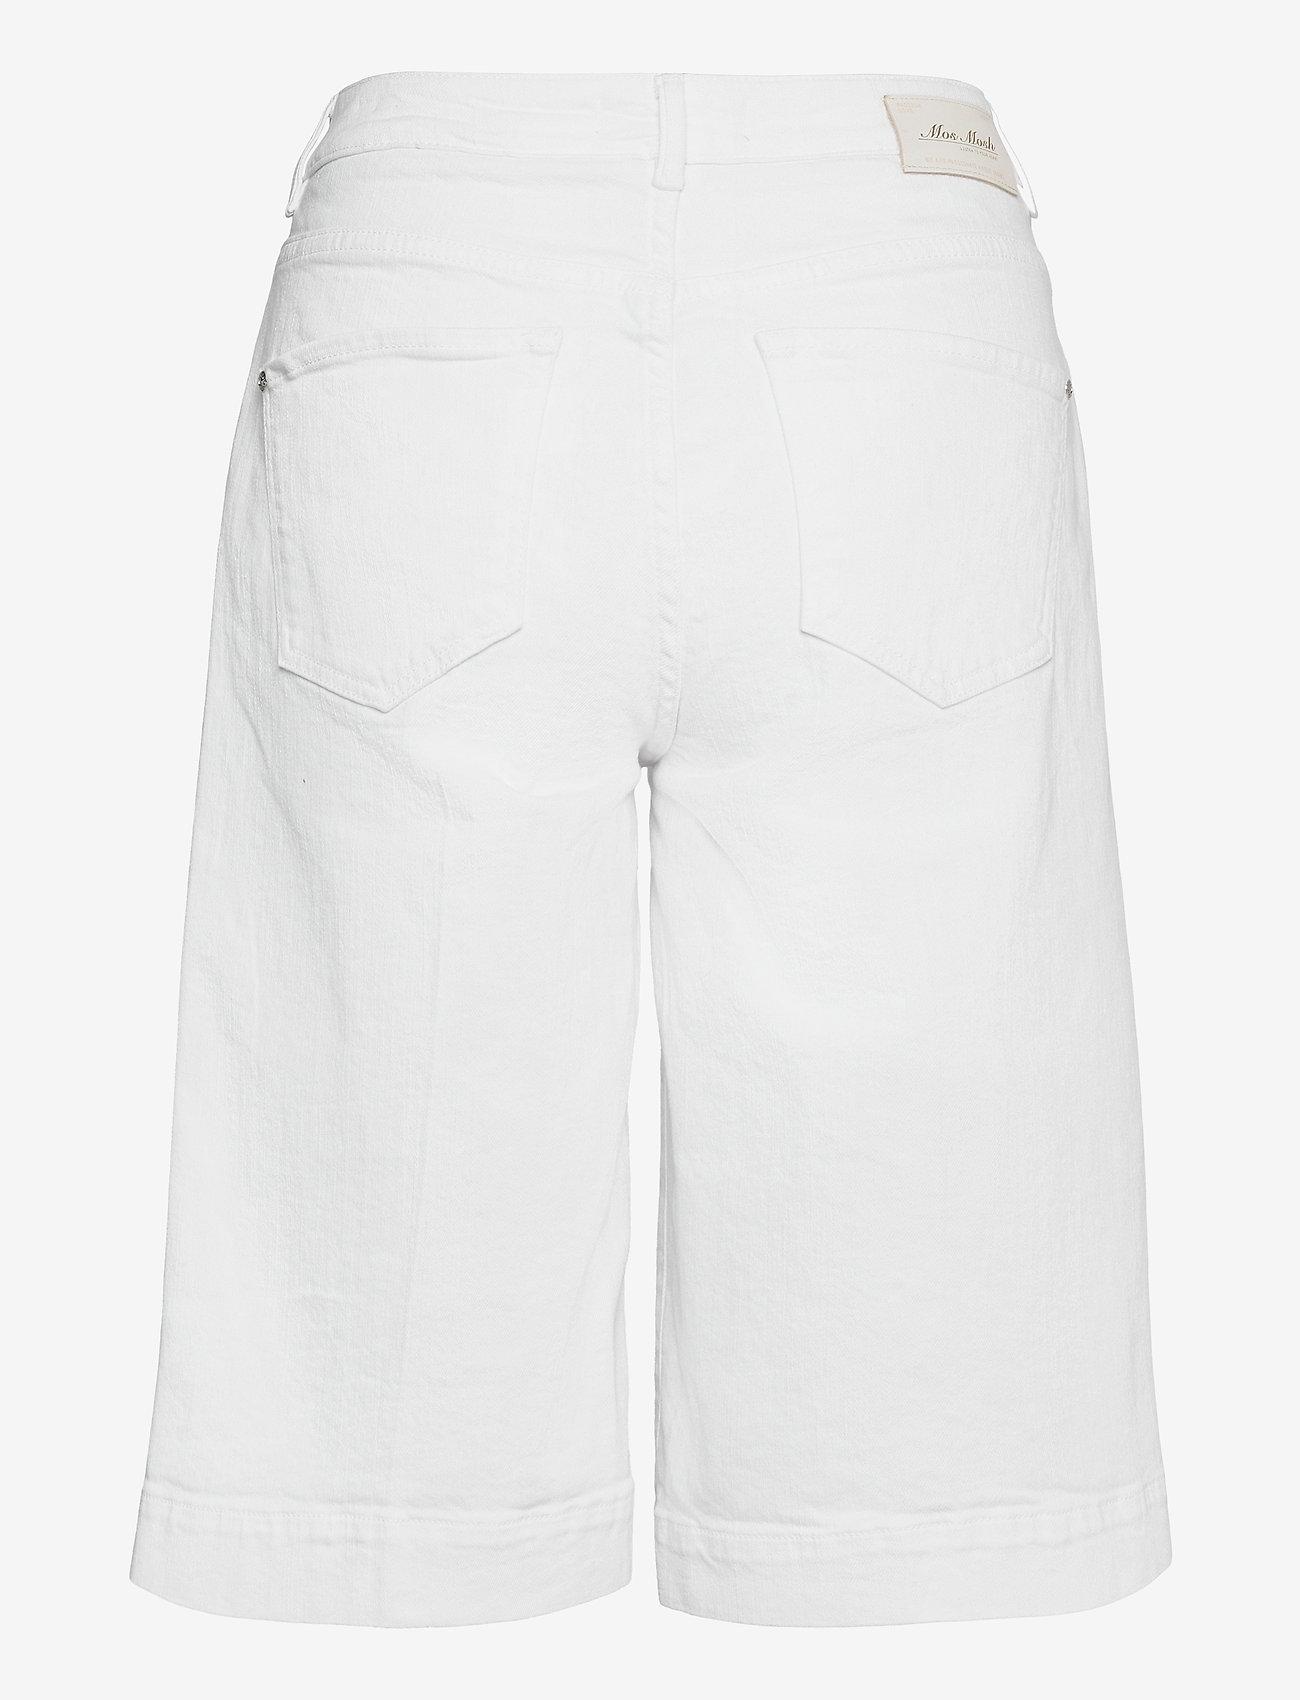 MOS MOSH - Zoe White Skirt Short - bermudas - white - 1